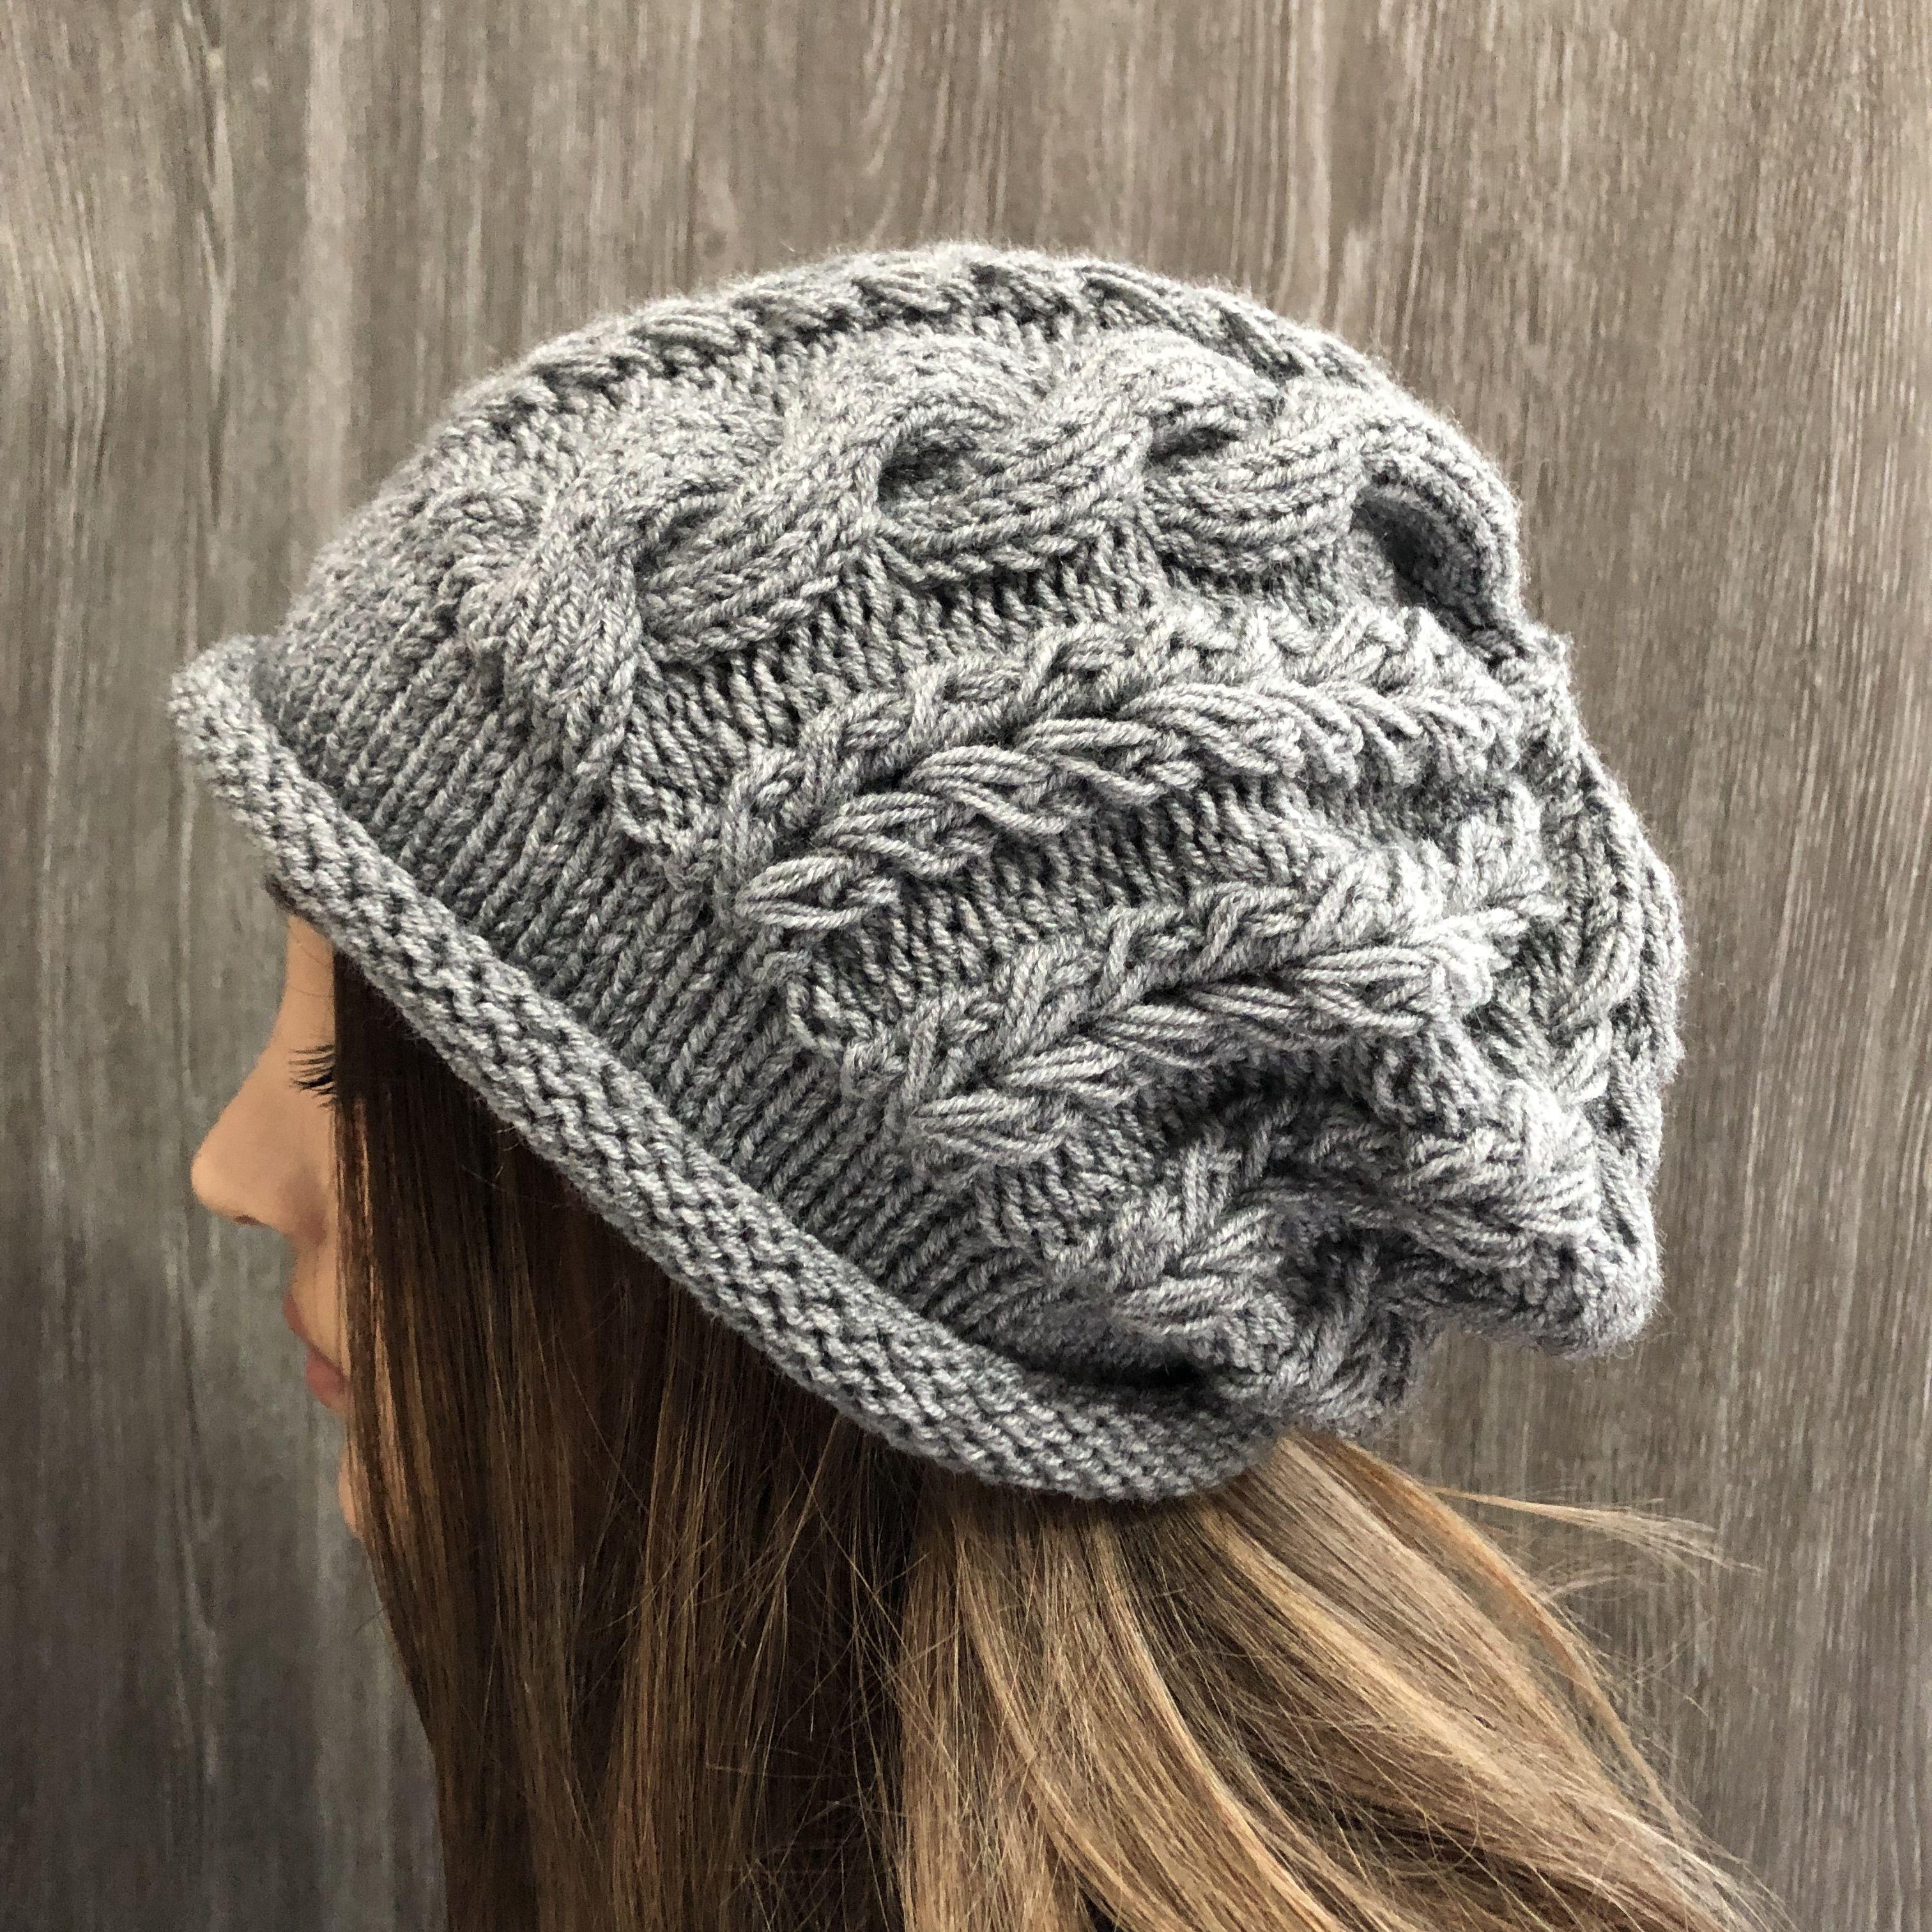 Boho hat Slouchy beanie Crochet hat Womens gift Women knit hat Crochet hat Winter hat Cable Knit Beanie Multicolor Slouchy hat